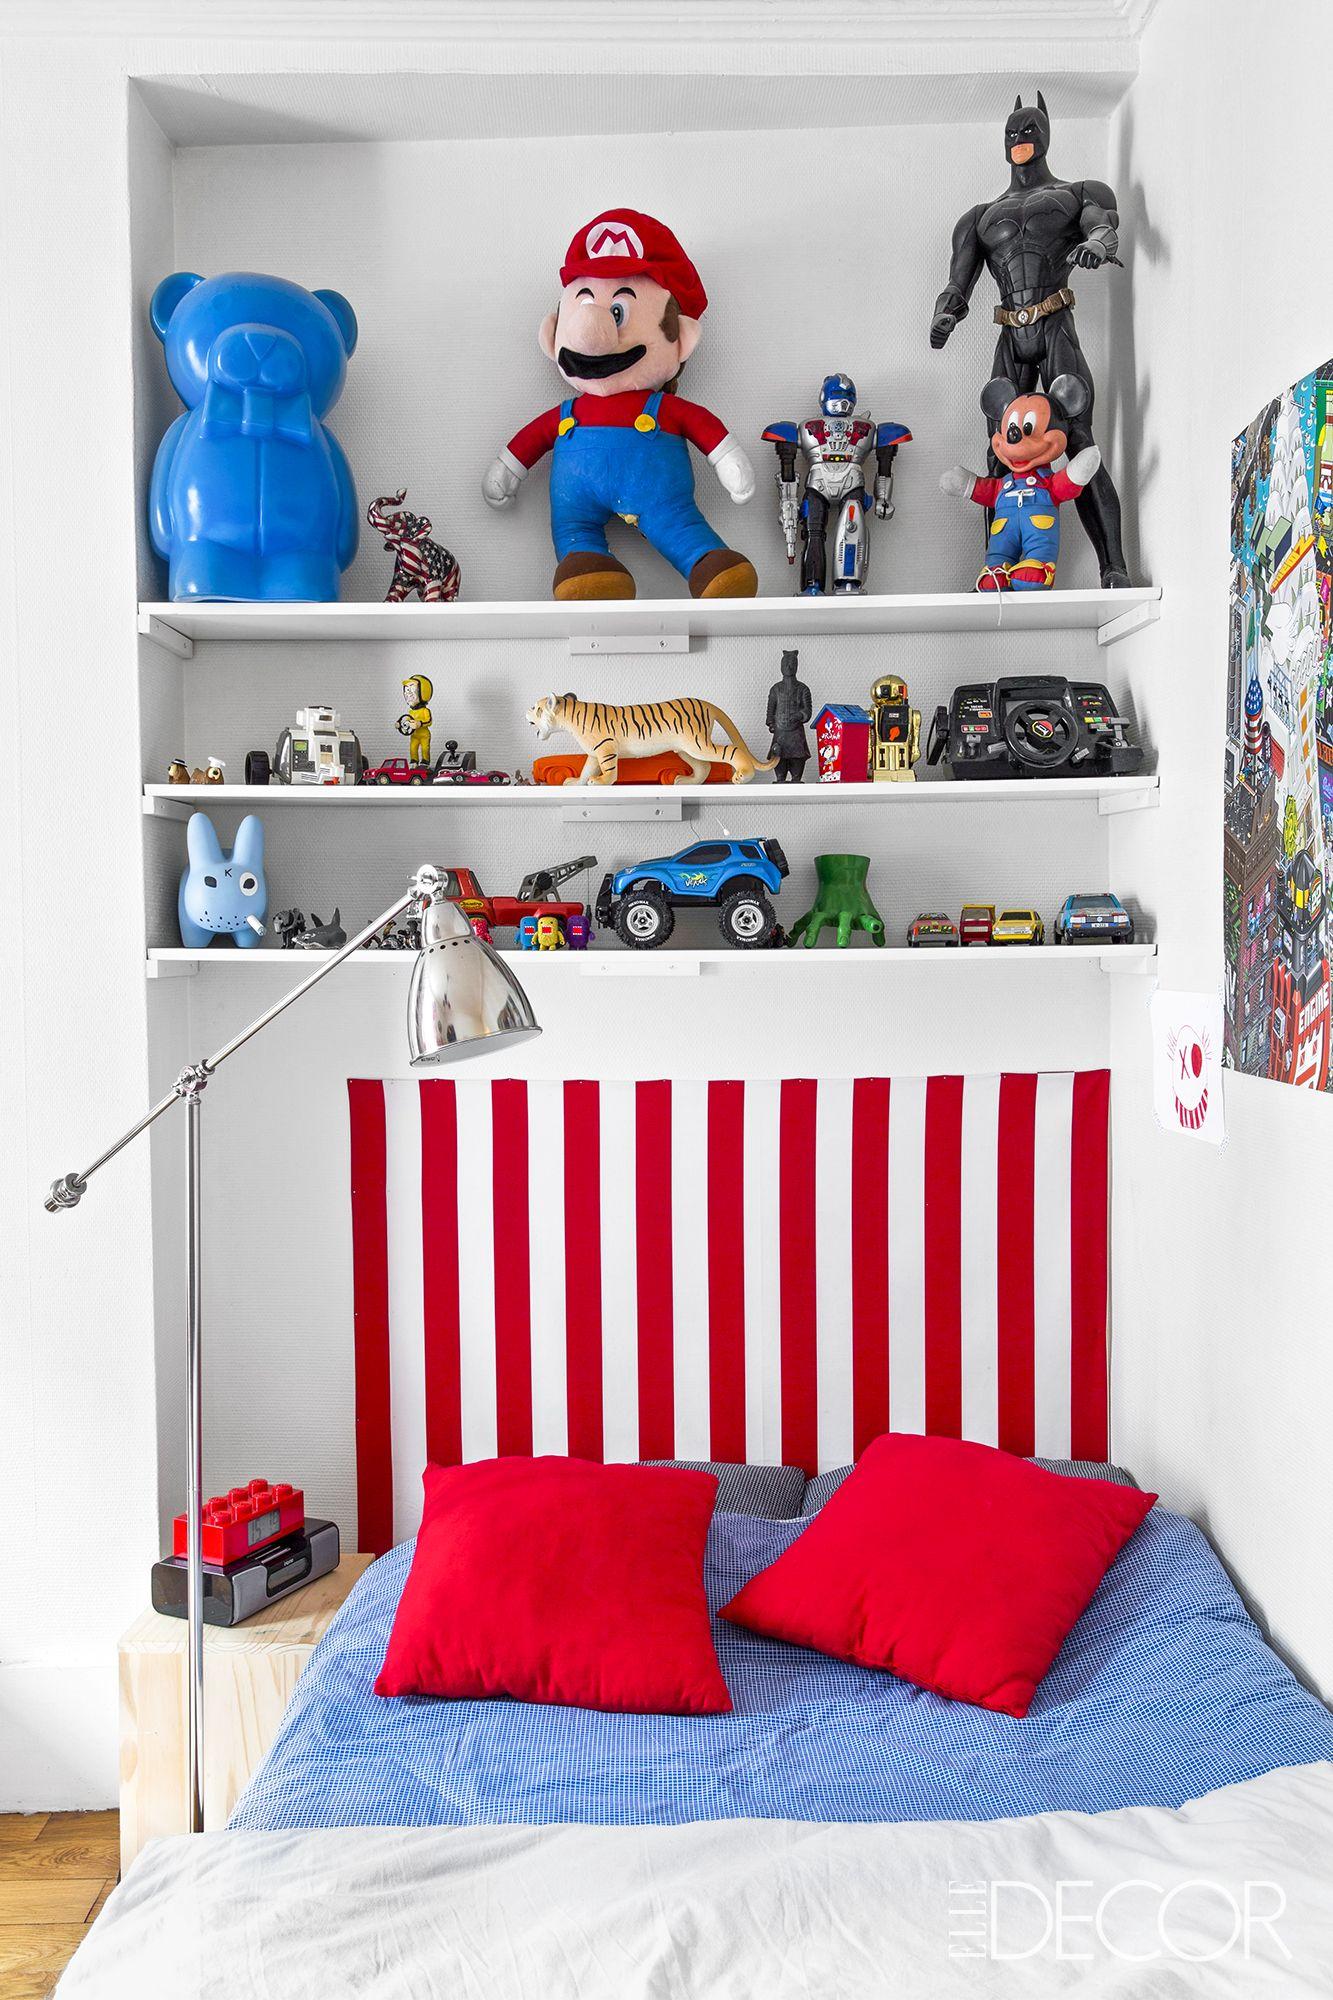 kids room decorating ideas  sc 1 st  Elle Decor & 18 Cool Kidsu0027 Room Decorating Ideas - Kids Room Decor